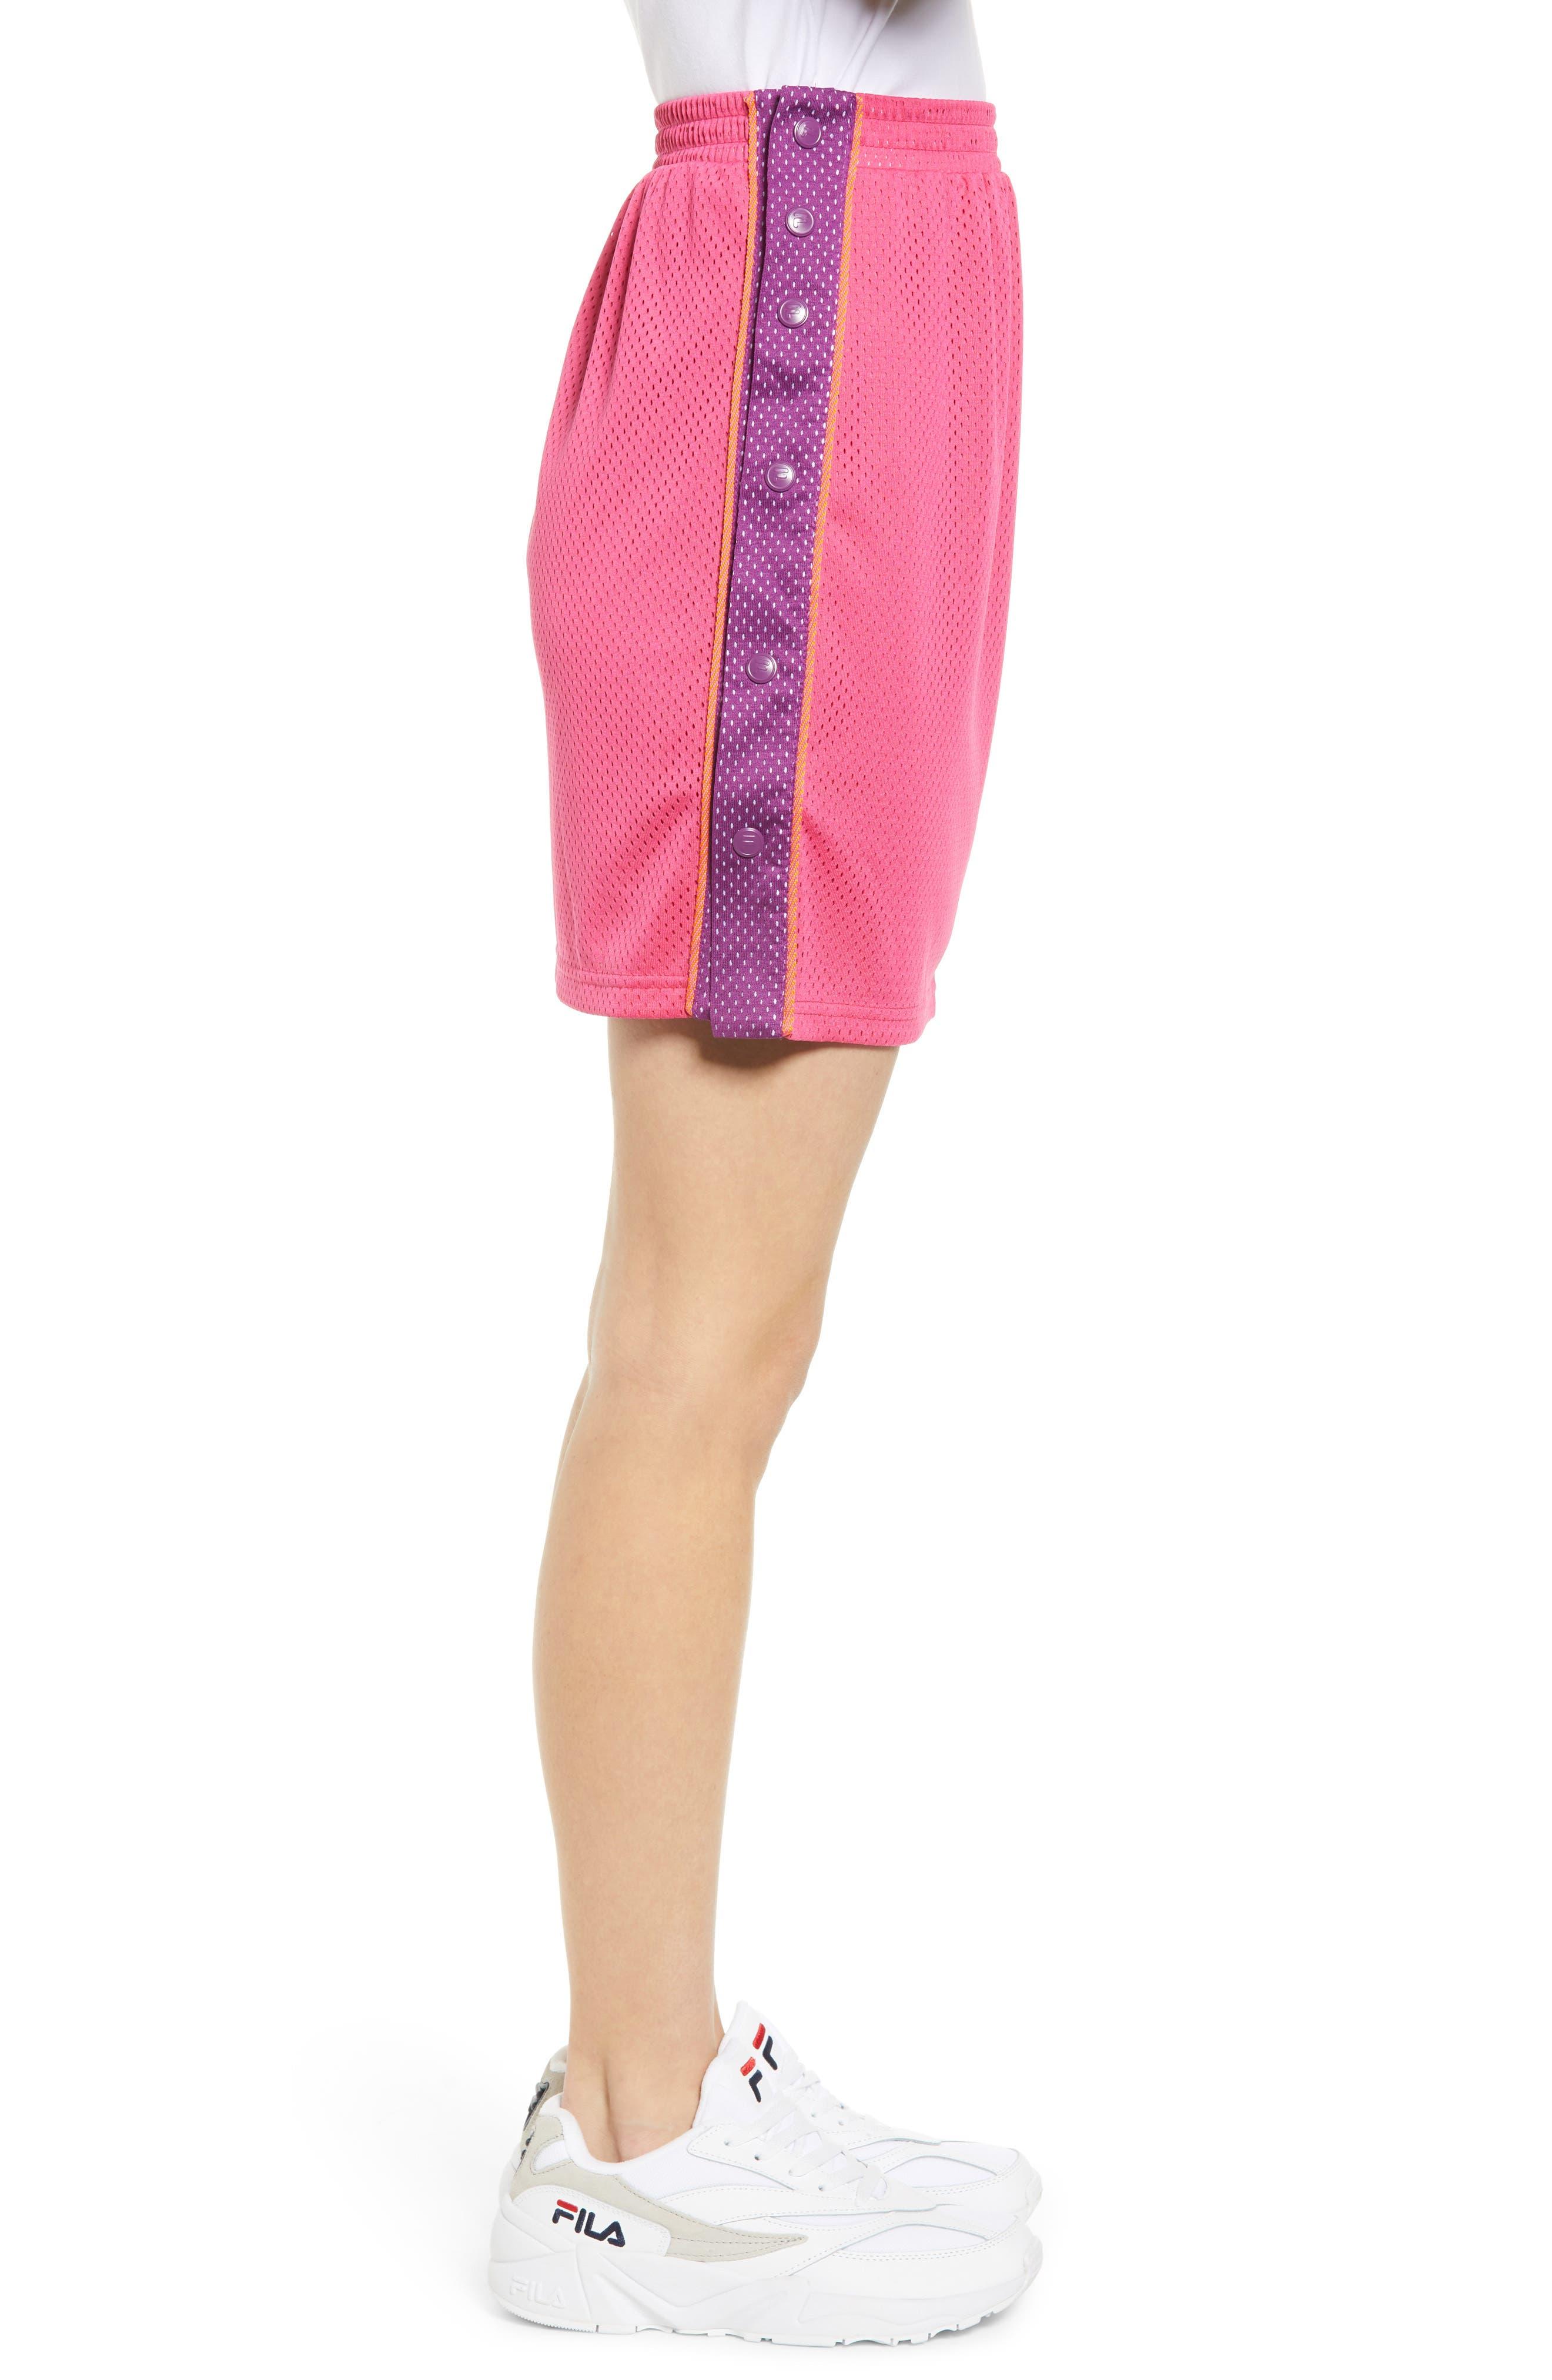 FILA, Miriam Tearaway Miniskirt, Alternate thumbnail 4, color, FUCHSIA PURPLE/ GRAPE/ GREEN